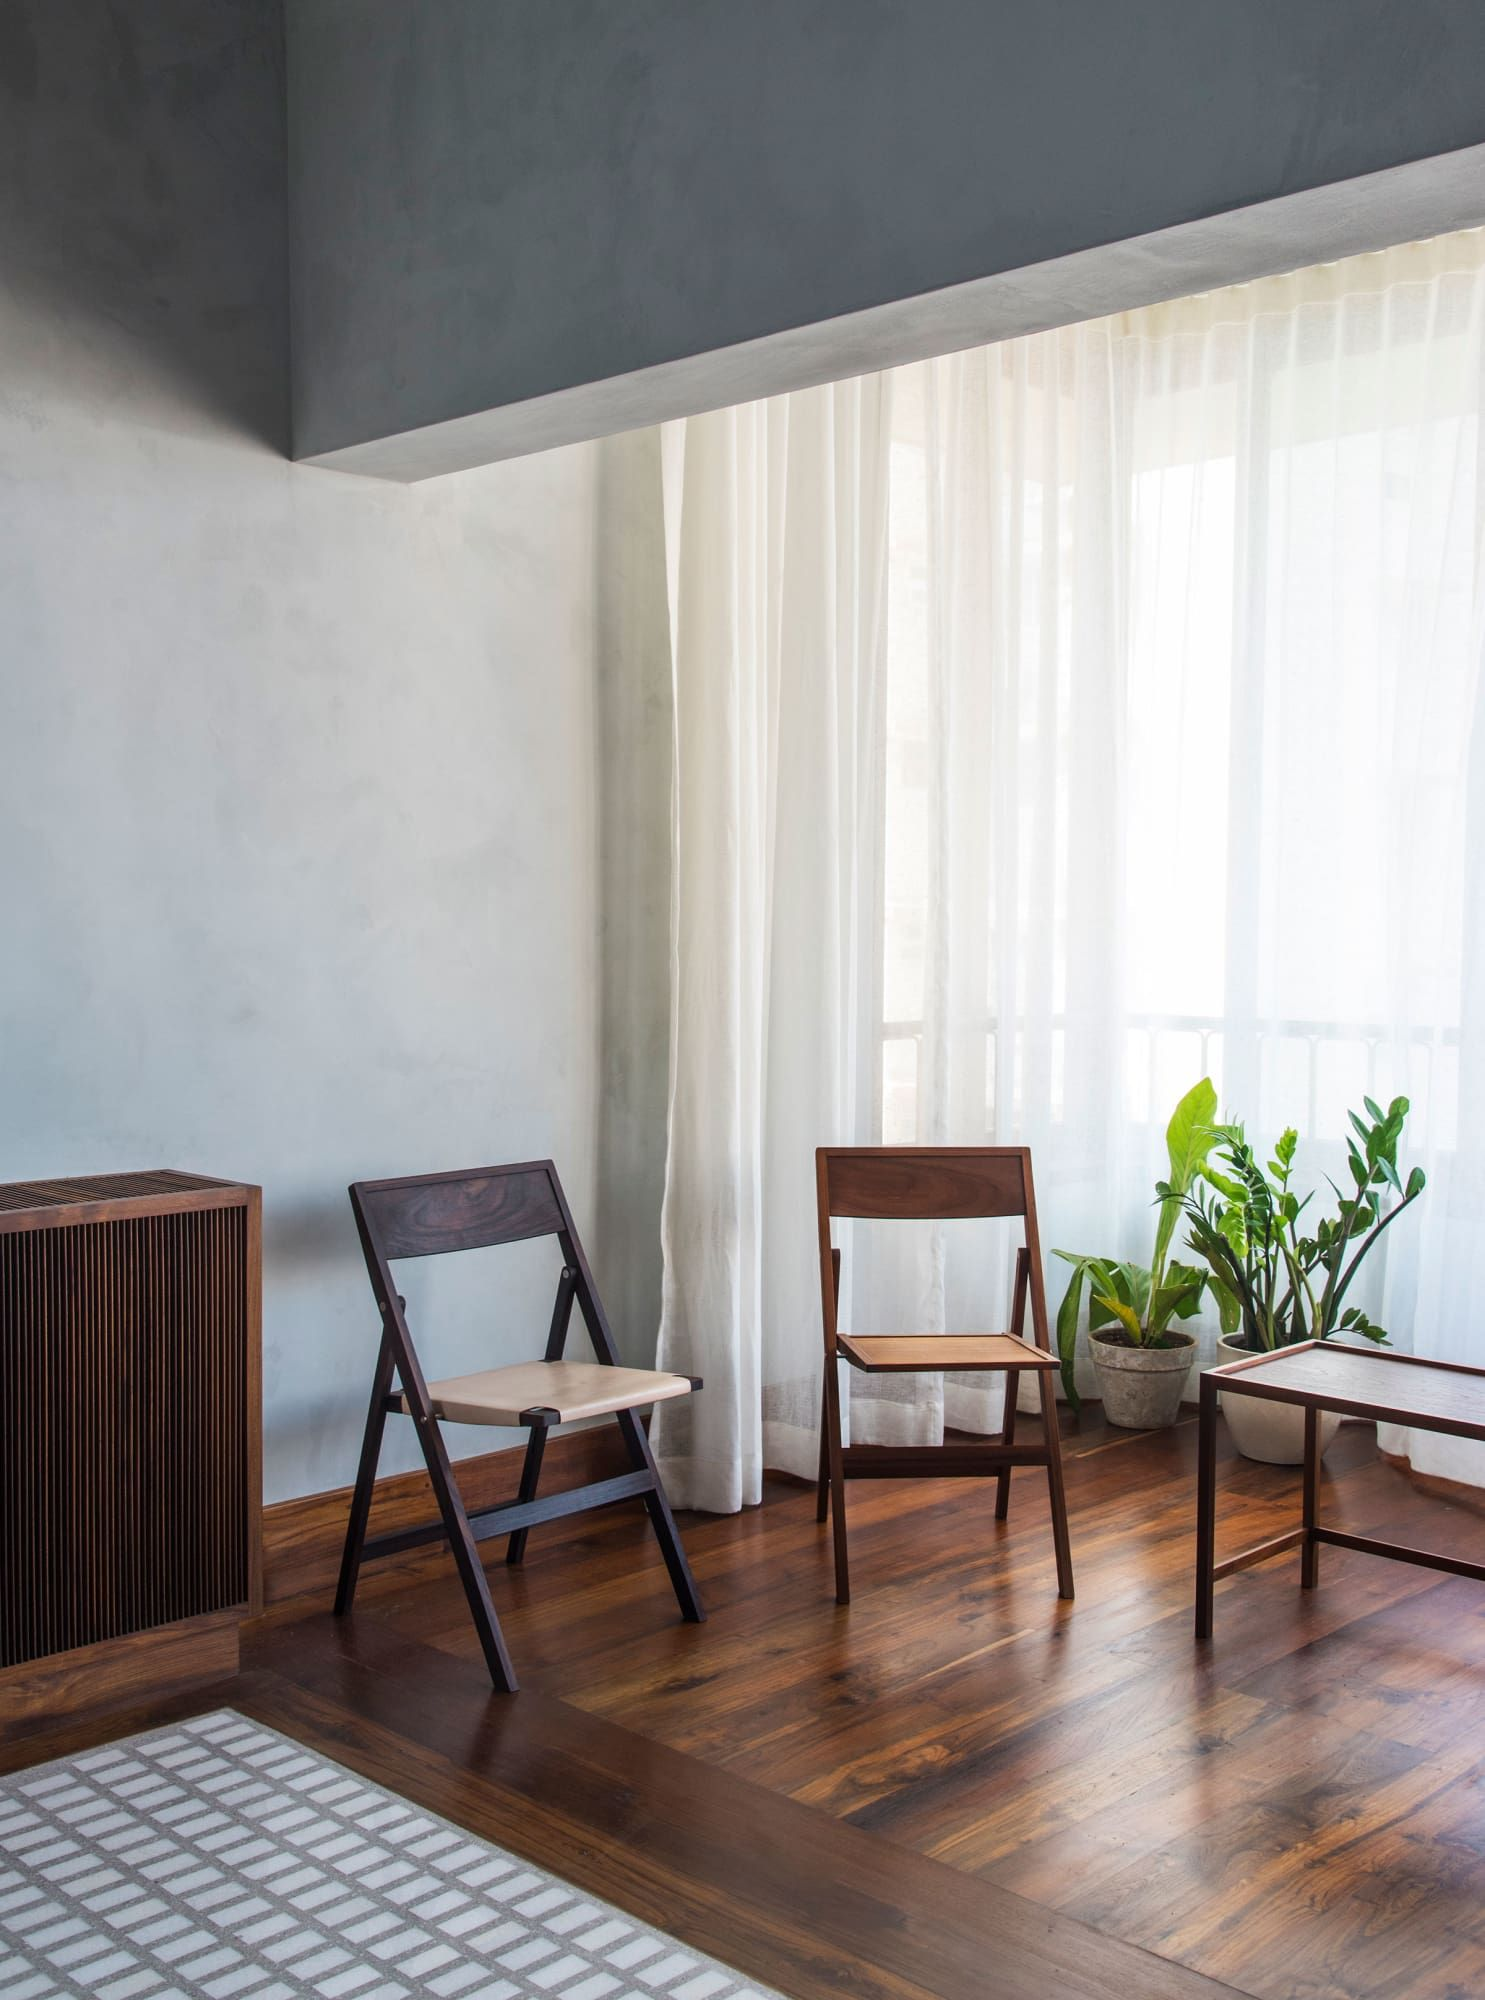 Case Design, ARIEL HUBER · Second Home on Malabar Hill · Divisare ...